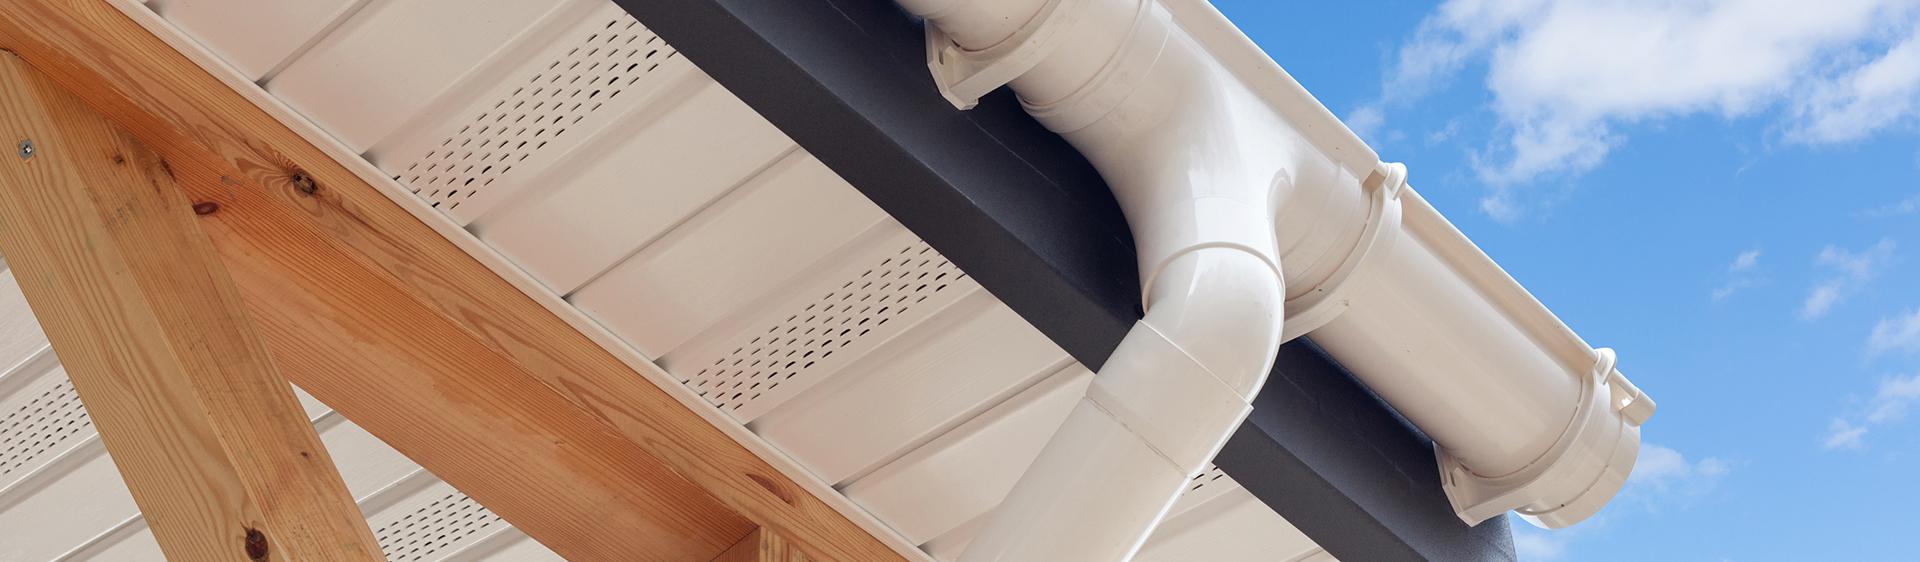 Wellington Eavestrough Installation, Gutter Installation and Aluminum Eavestrough Installation